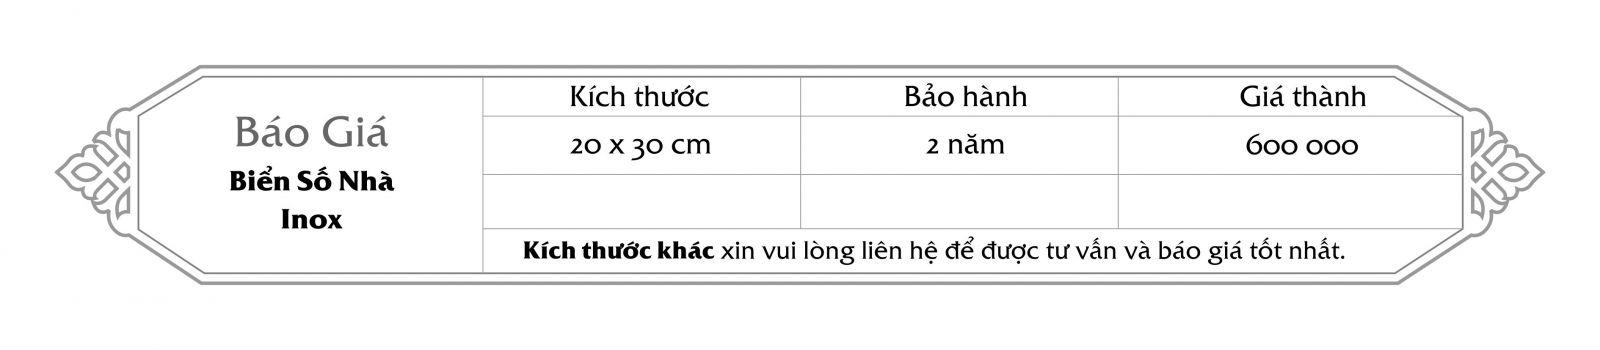 Bao-gia-bien-so-nha Biển Số nhà inox